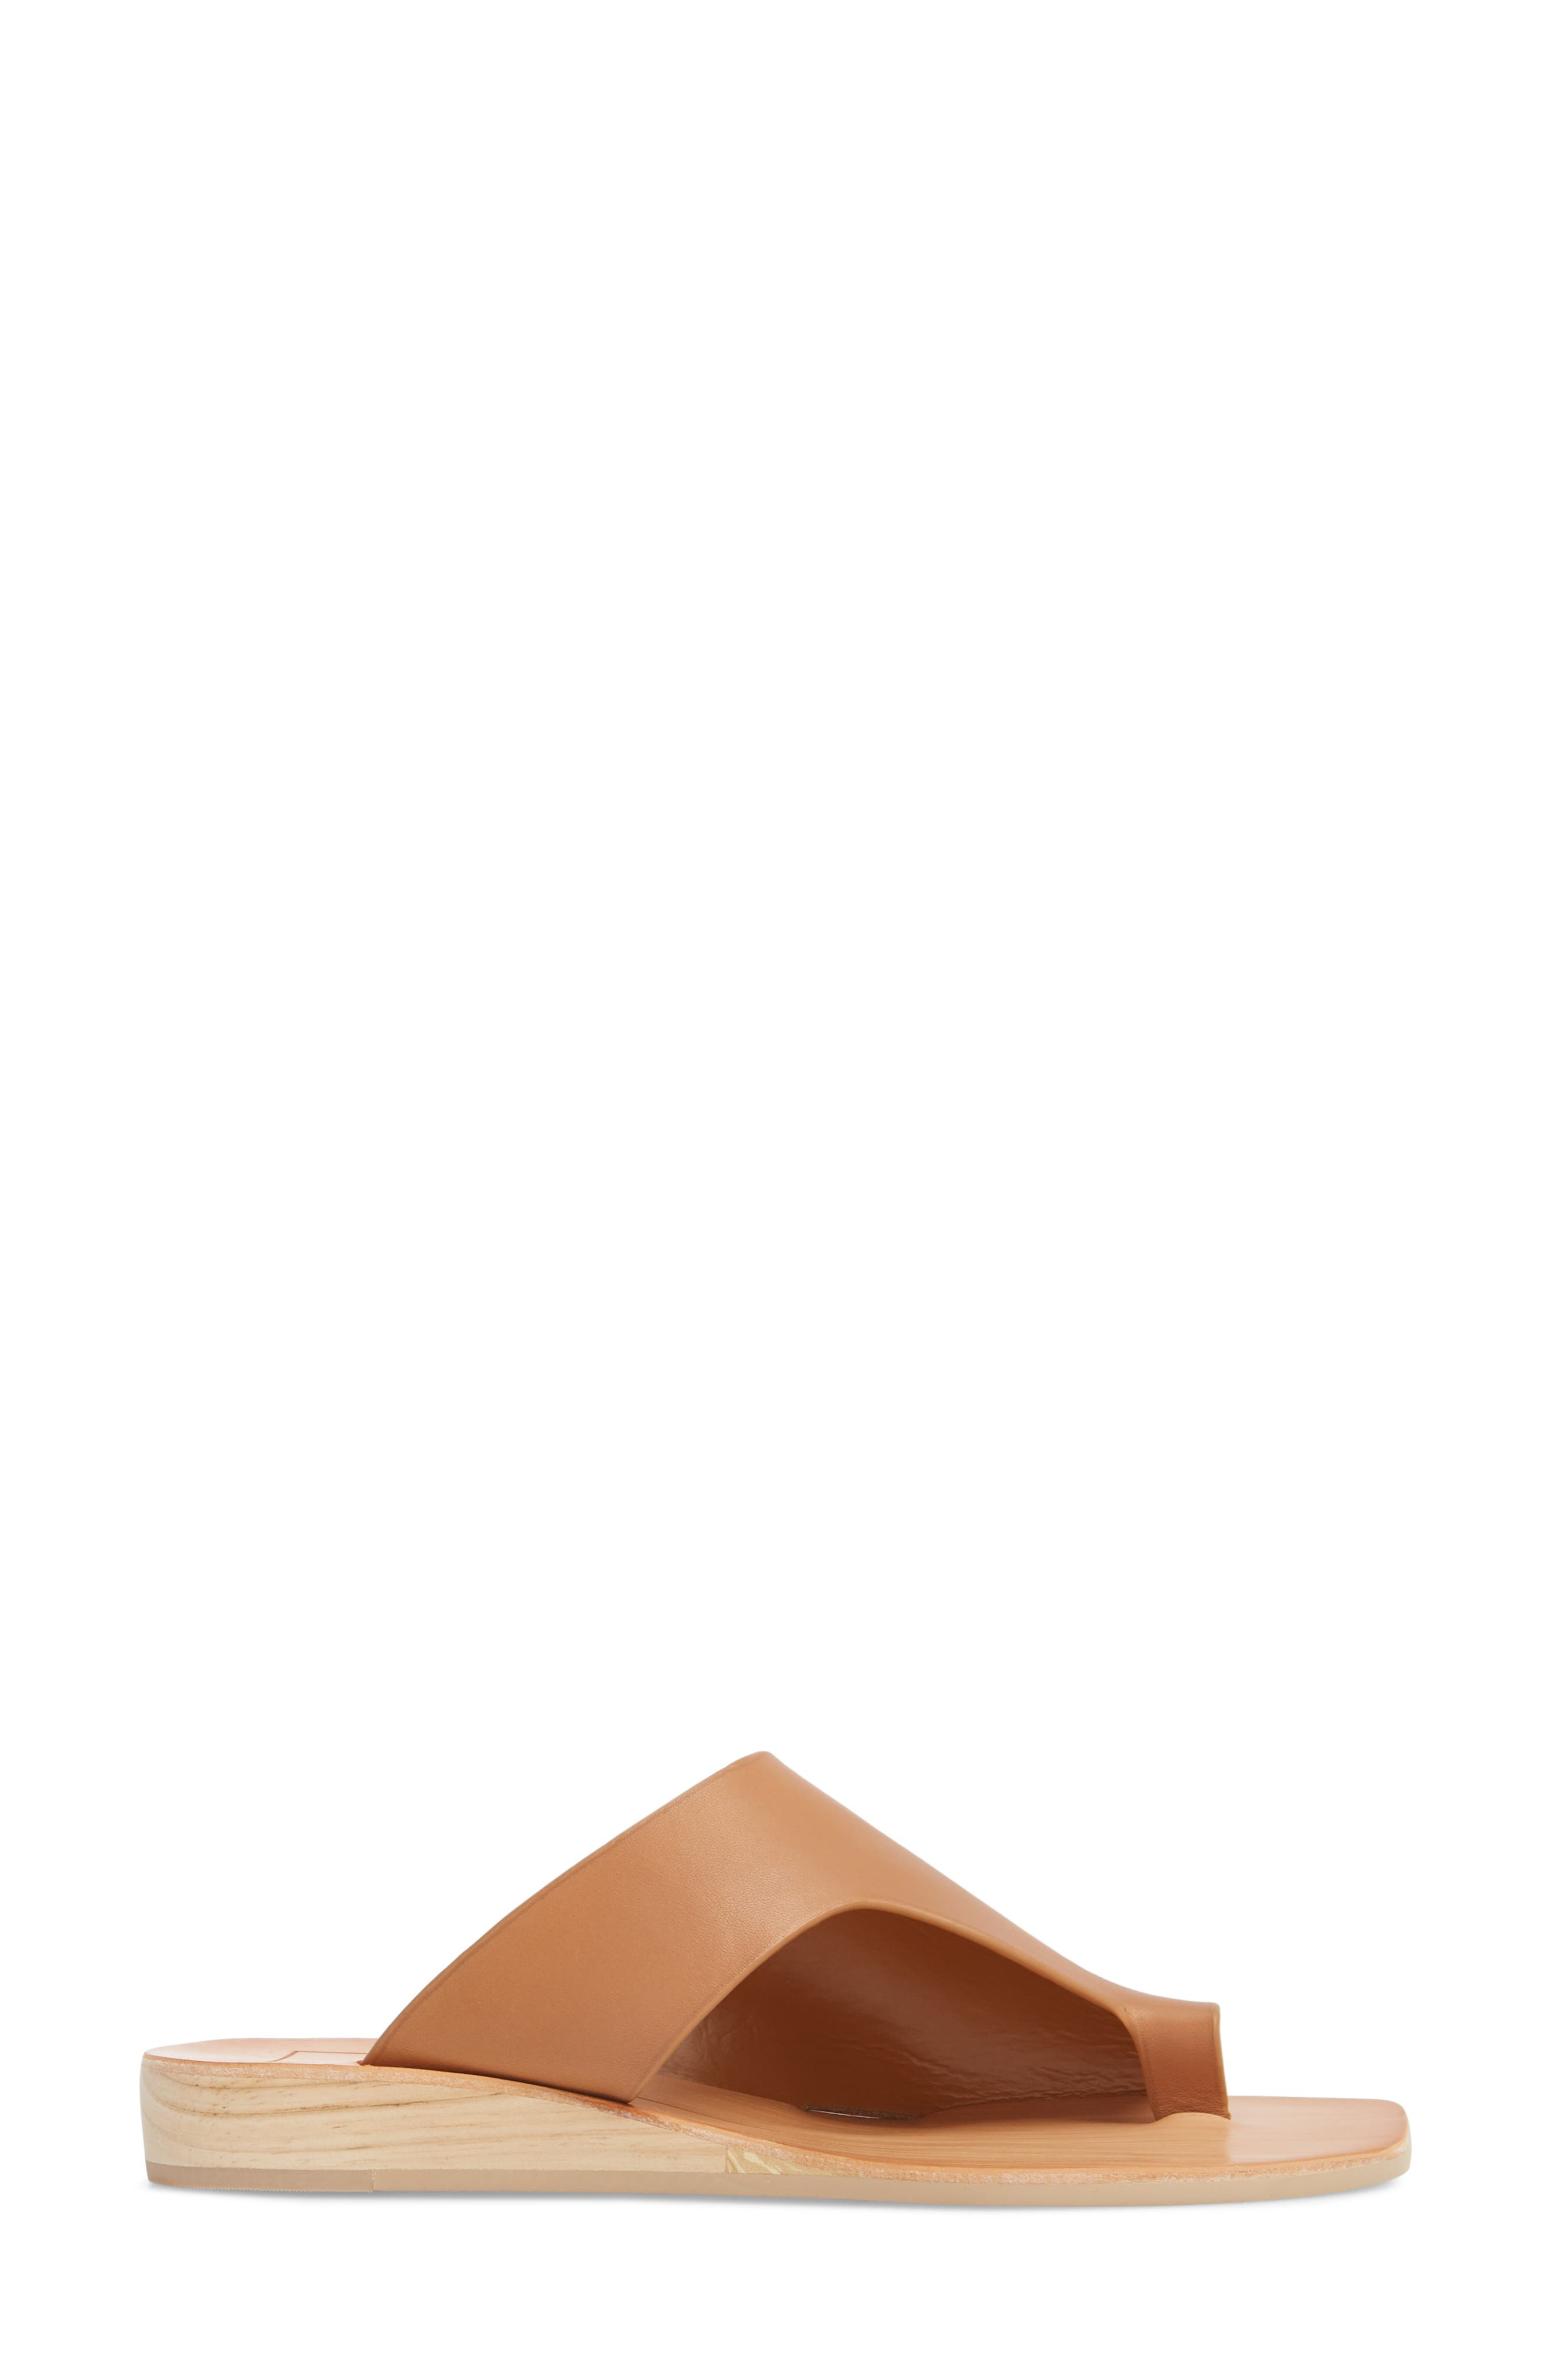 Hazle Genuine Calf Hair Sandal,                             Alternate thumbnail 8, color,